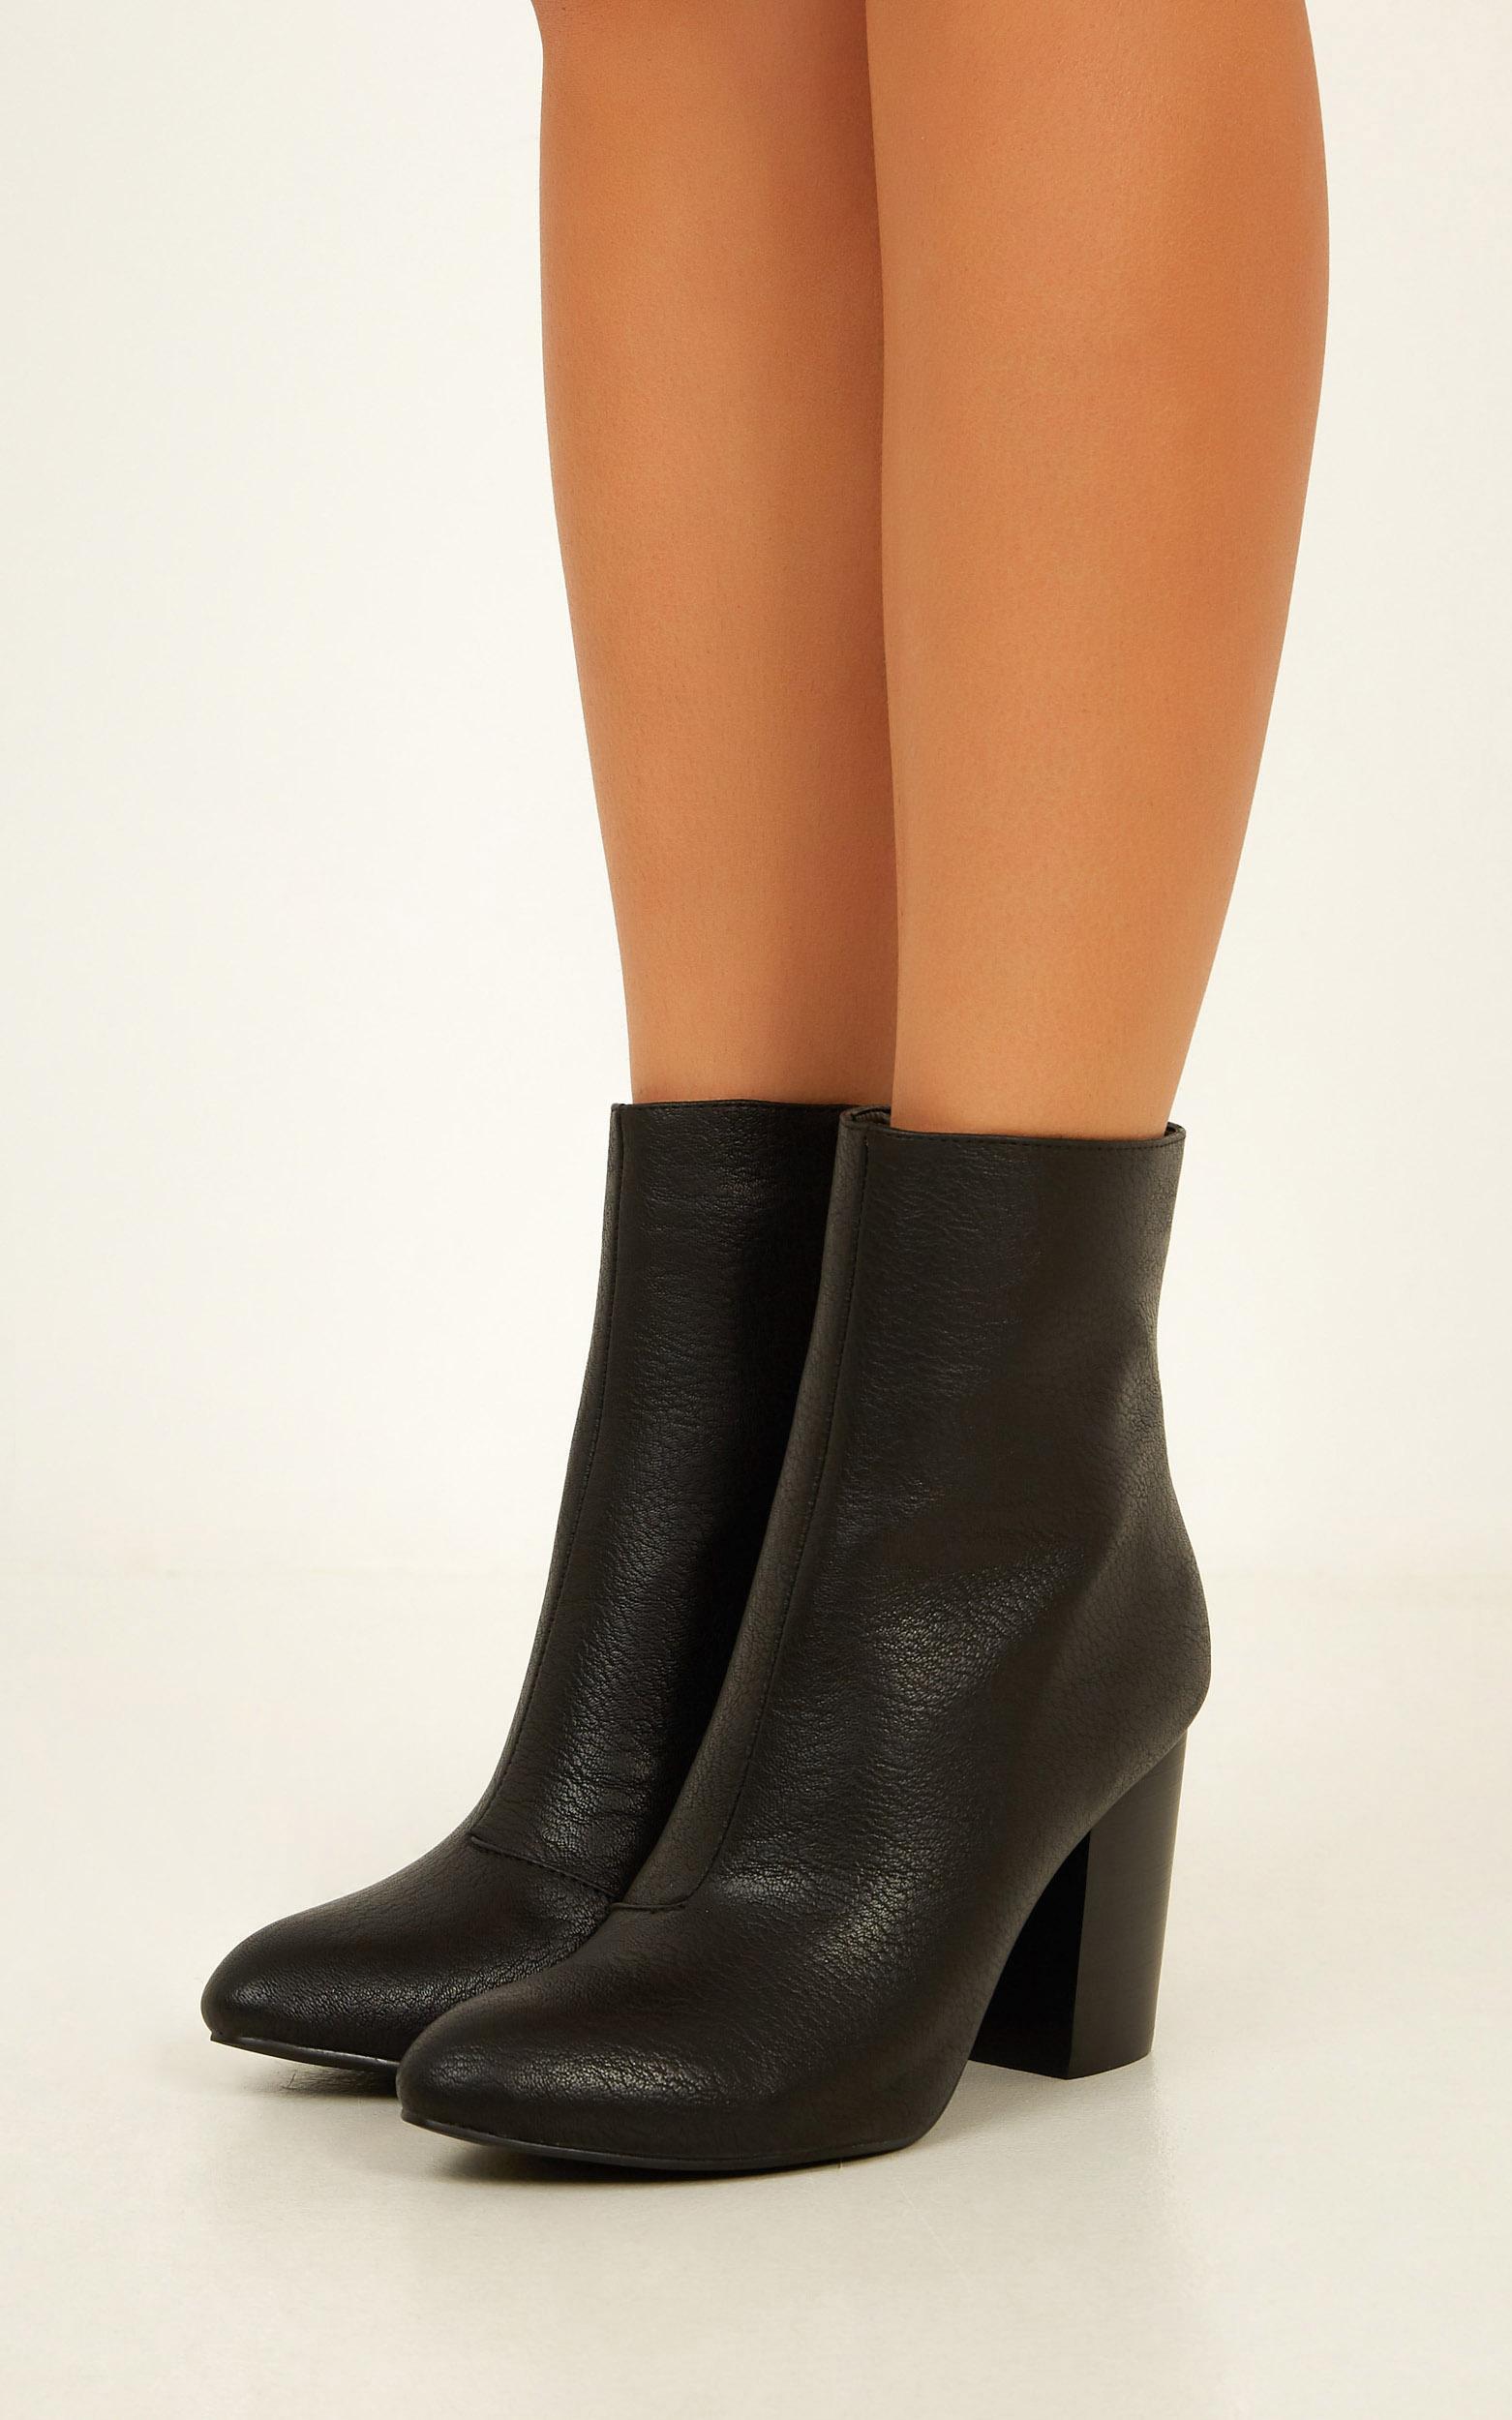 Billini - Janita boots in black tumble - 10, Black, hi-res image number null